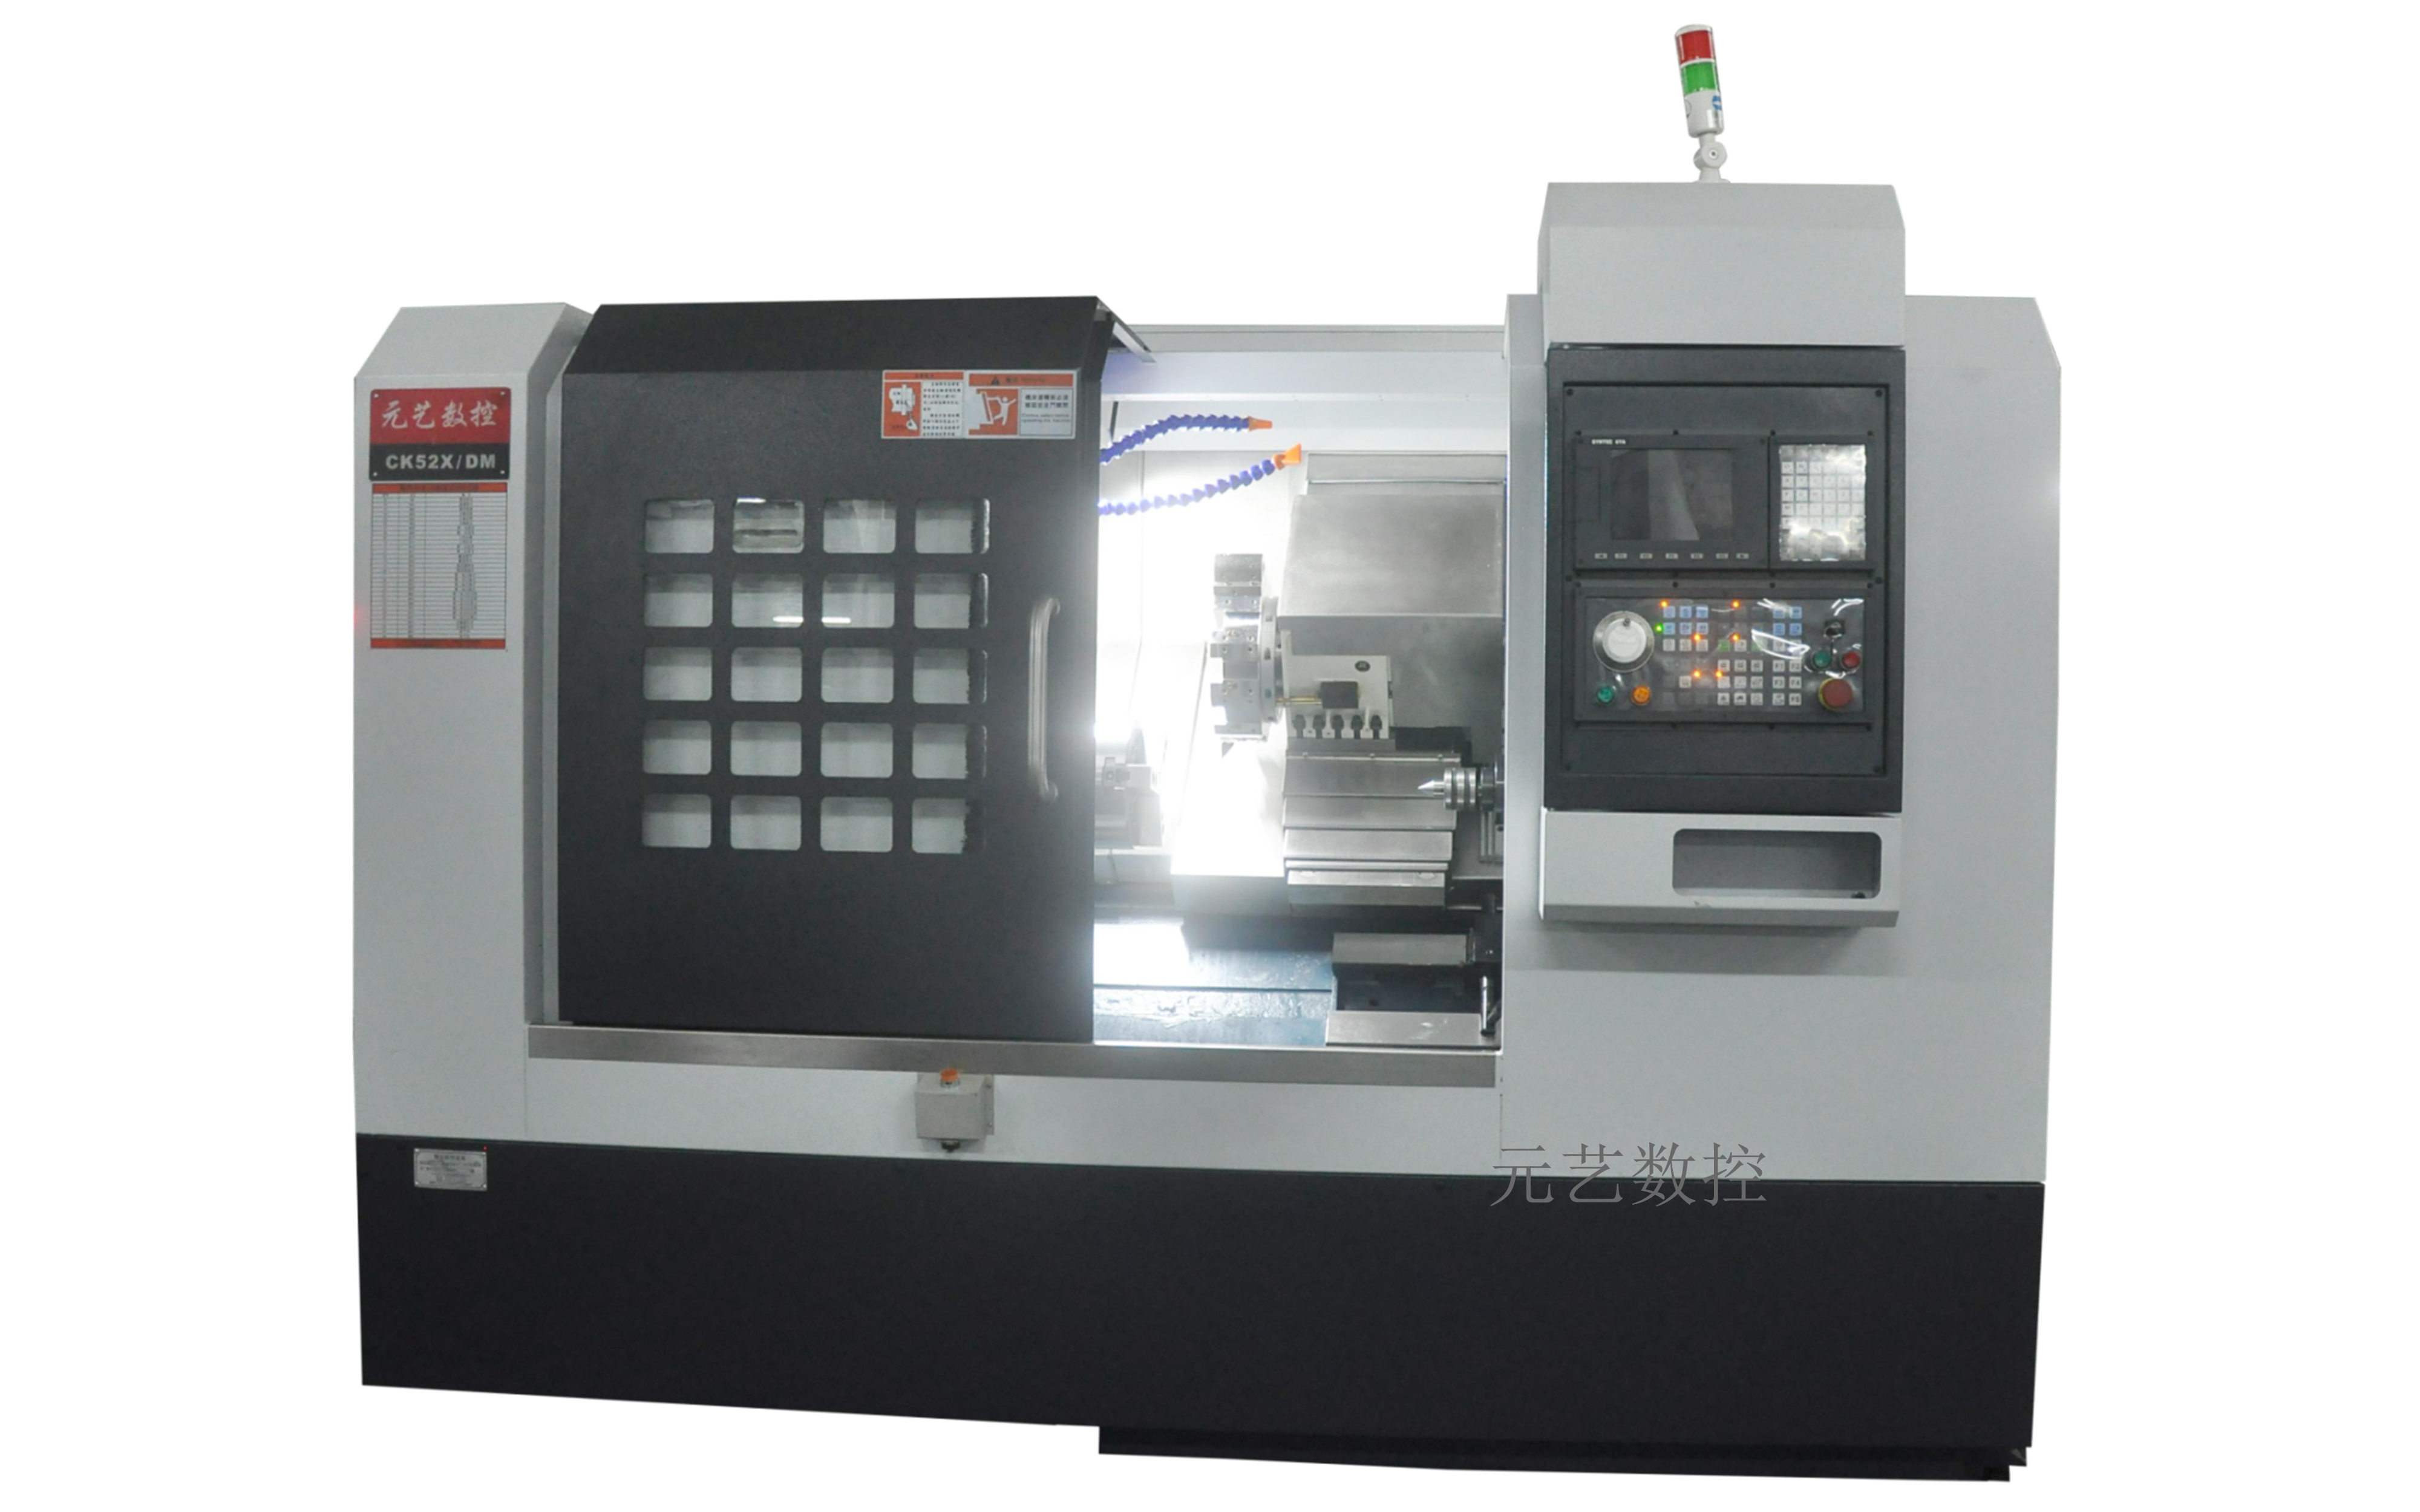 CK52X/DM刀塔斜轨尾座精密数控车床(带液压顶针)